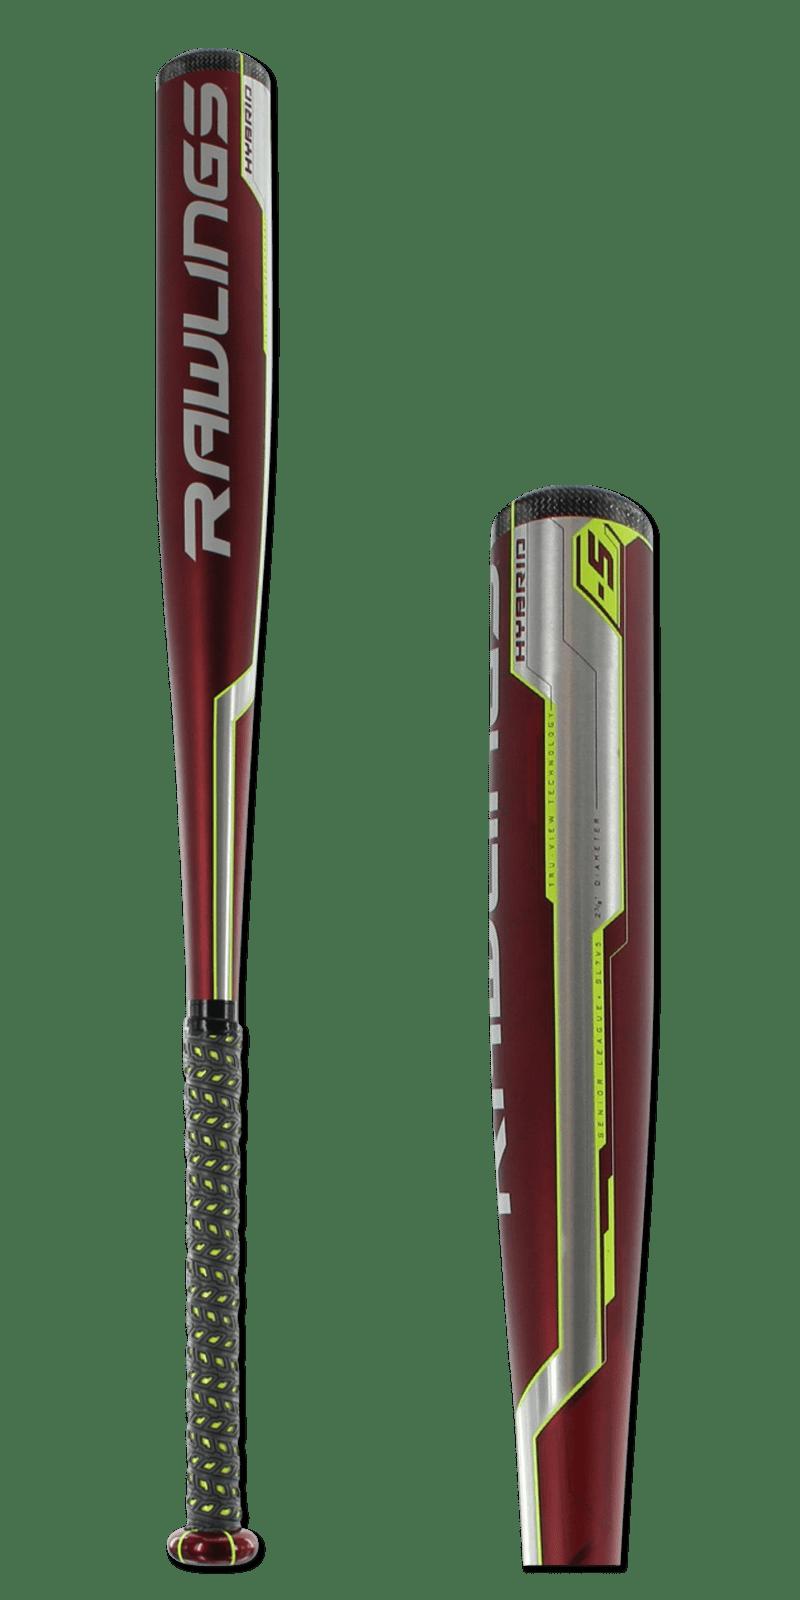 2017 Rawlings VELO Senior League Baseball Bat: SL7V5 by Rawlings